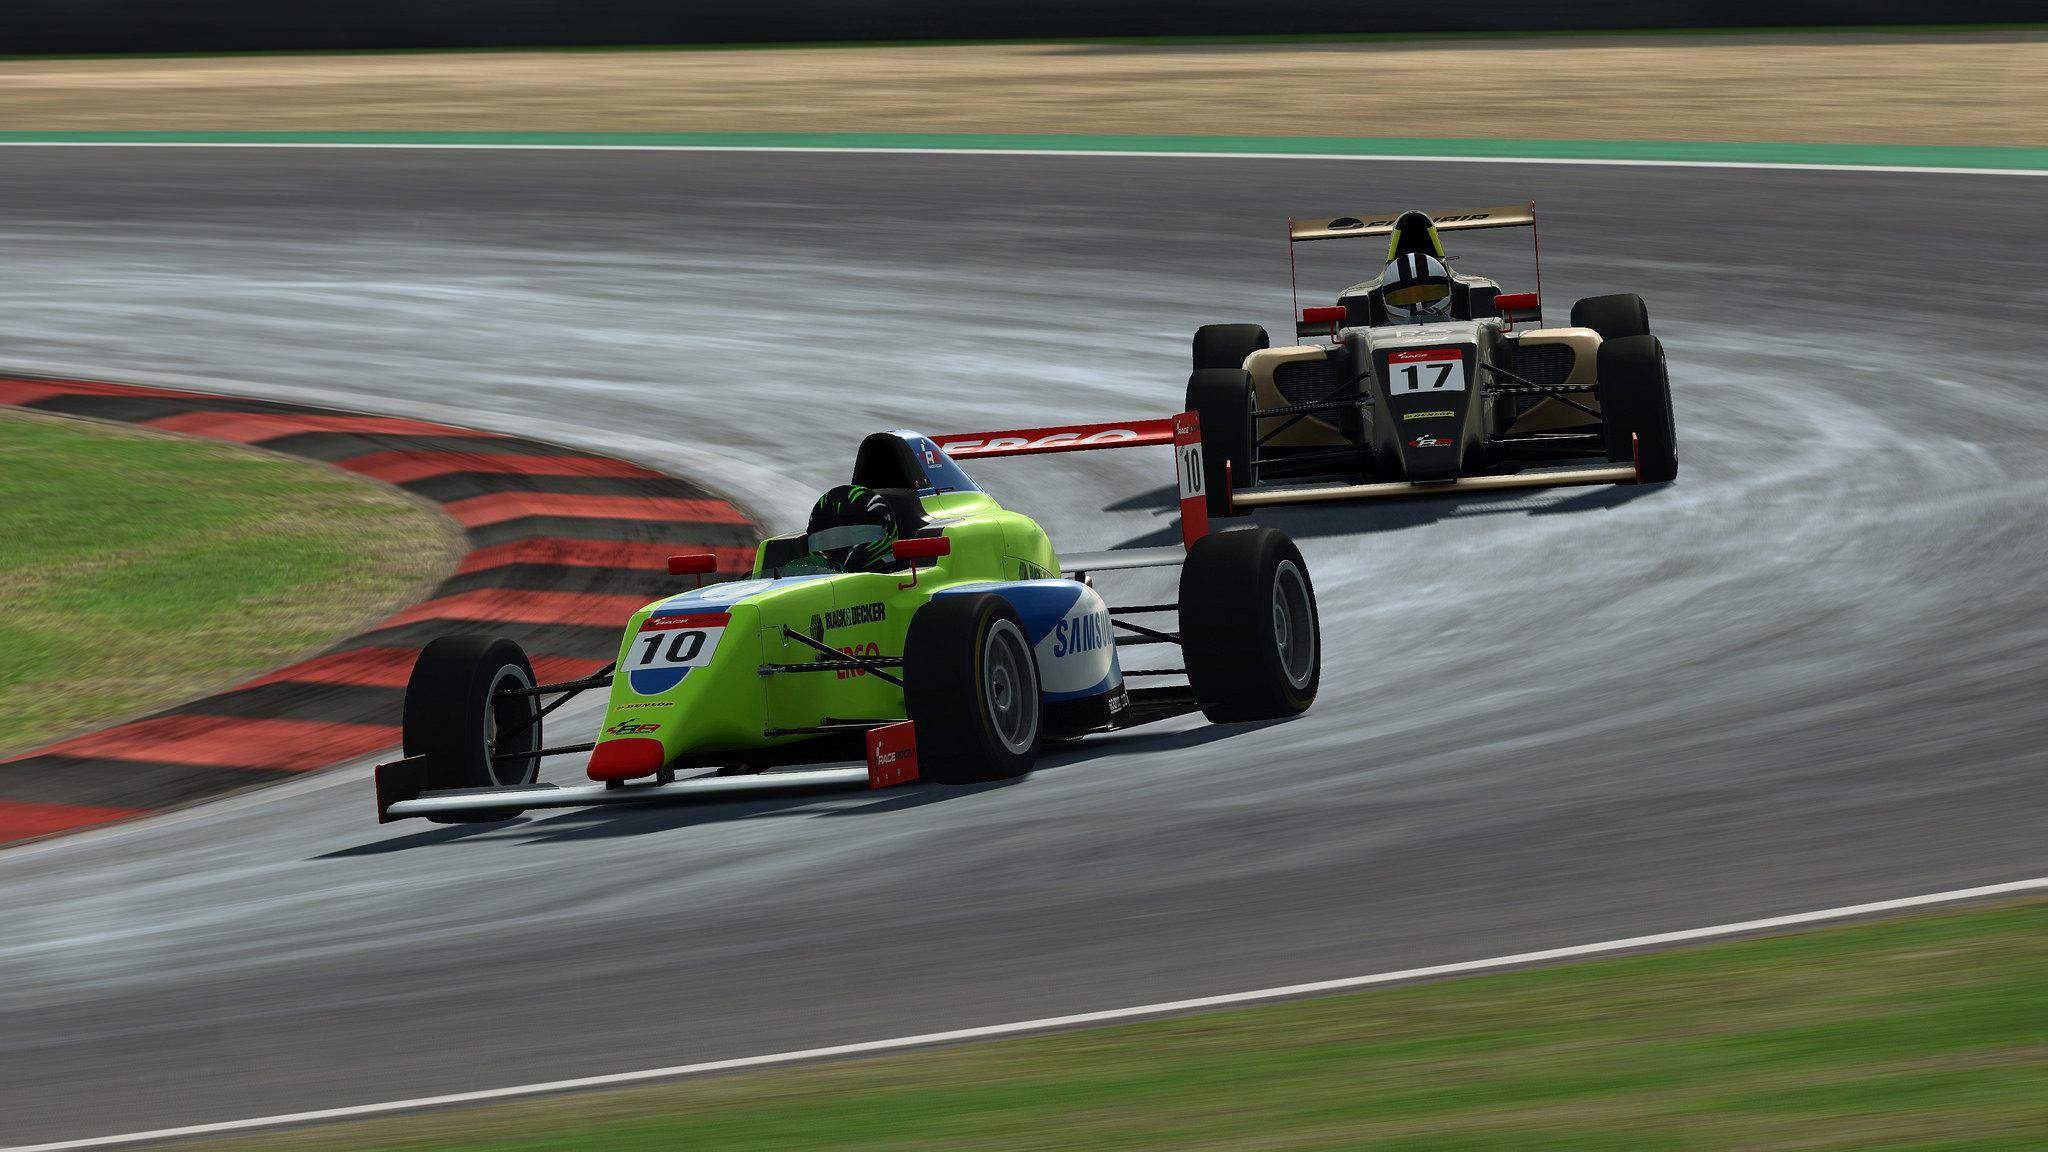 Tatuus F4 Raceroom VR Gameplay HP Reverb G2